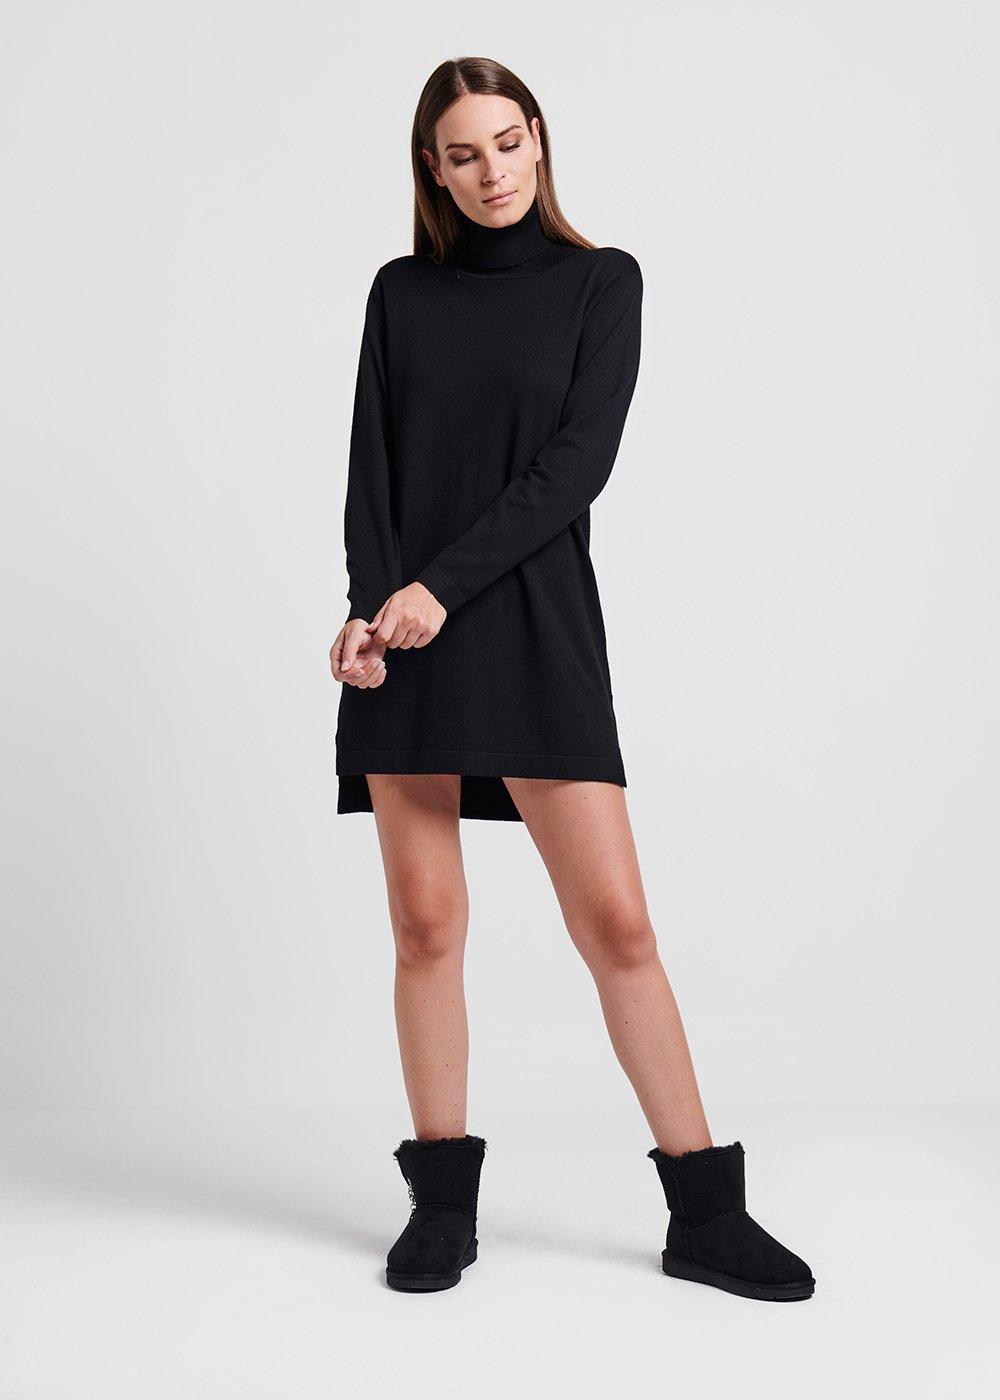 Bouclé viscose dress - Black - Woman